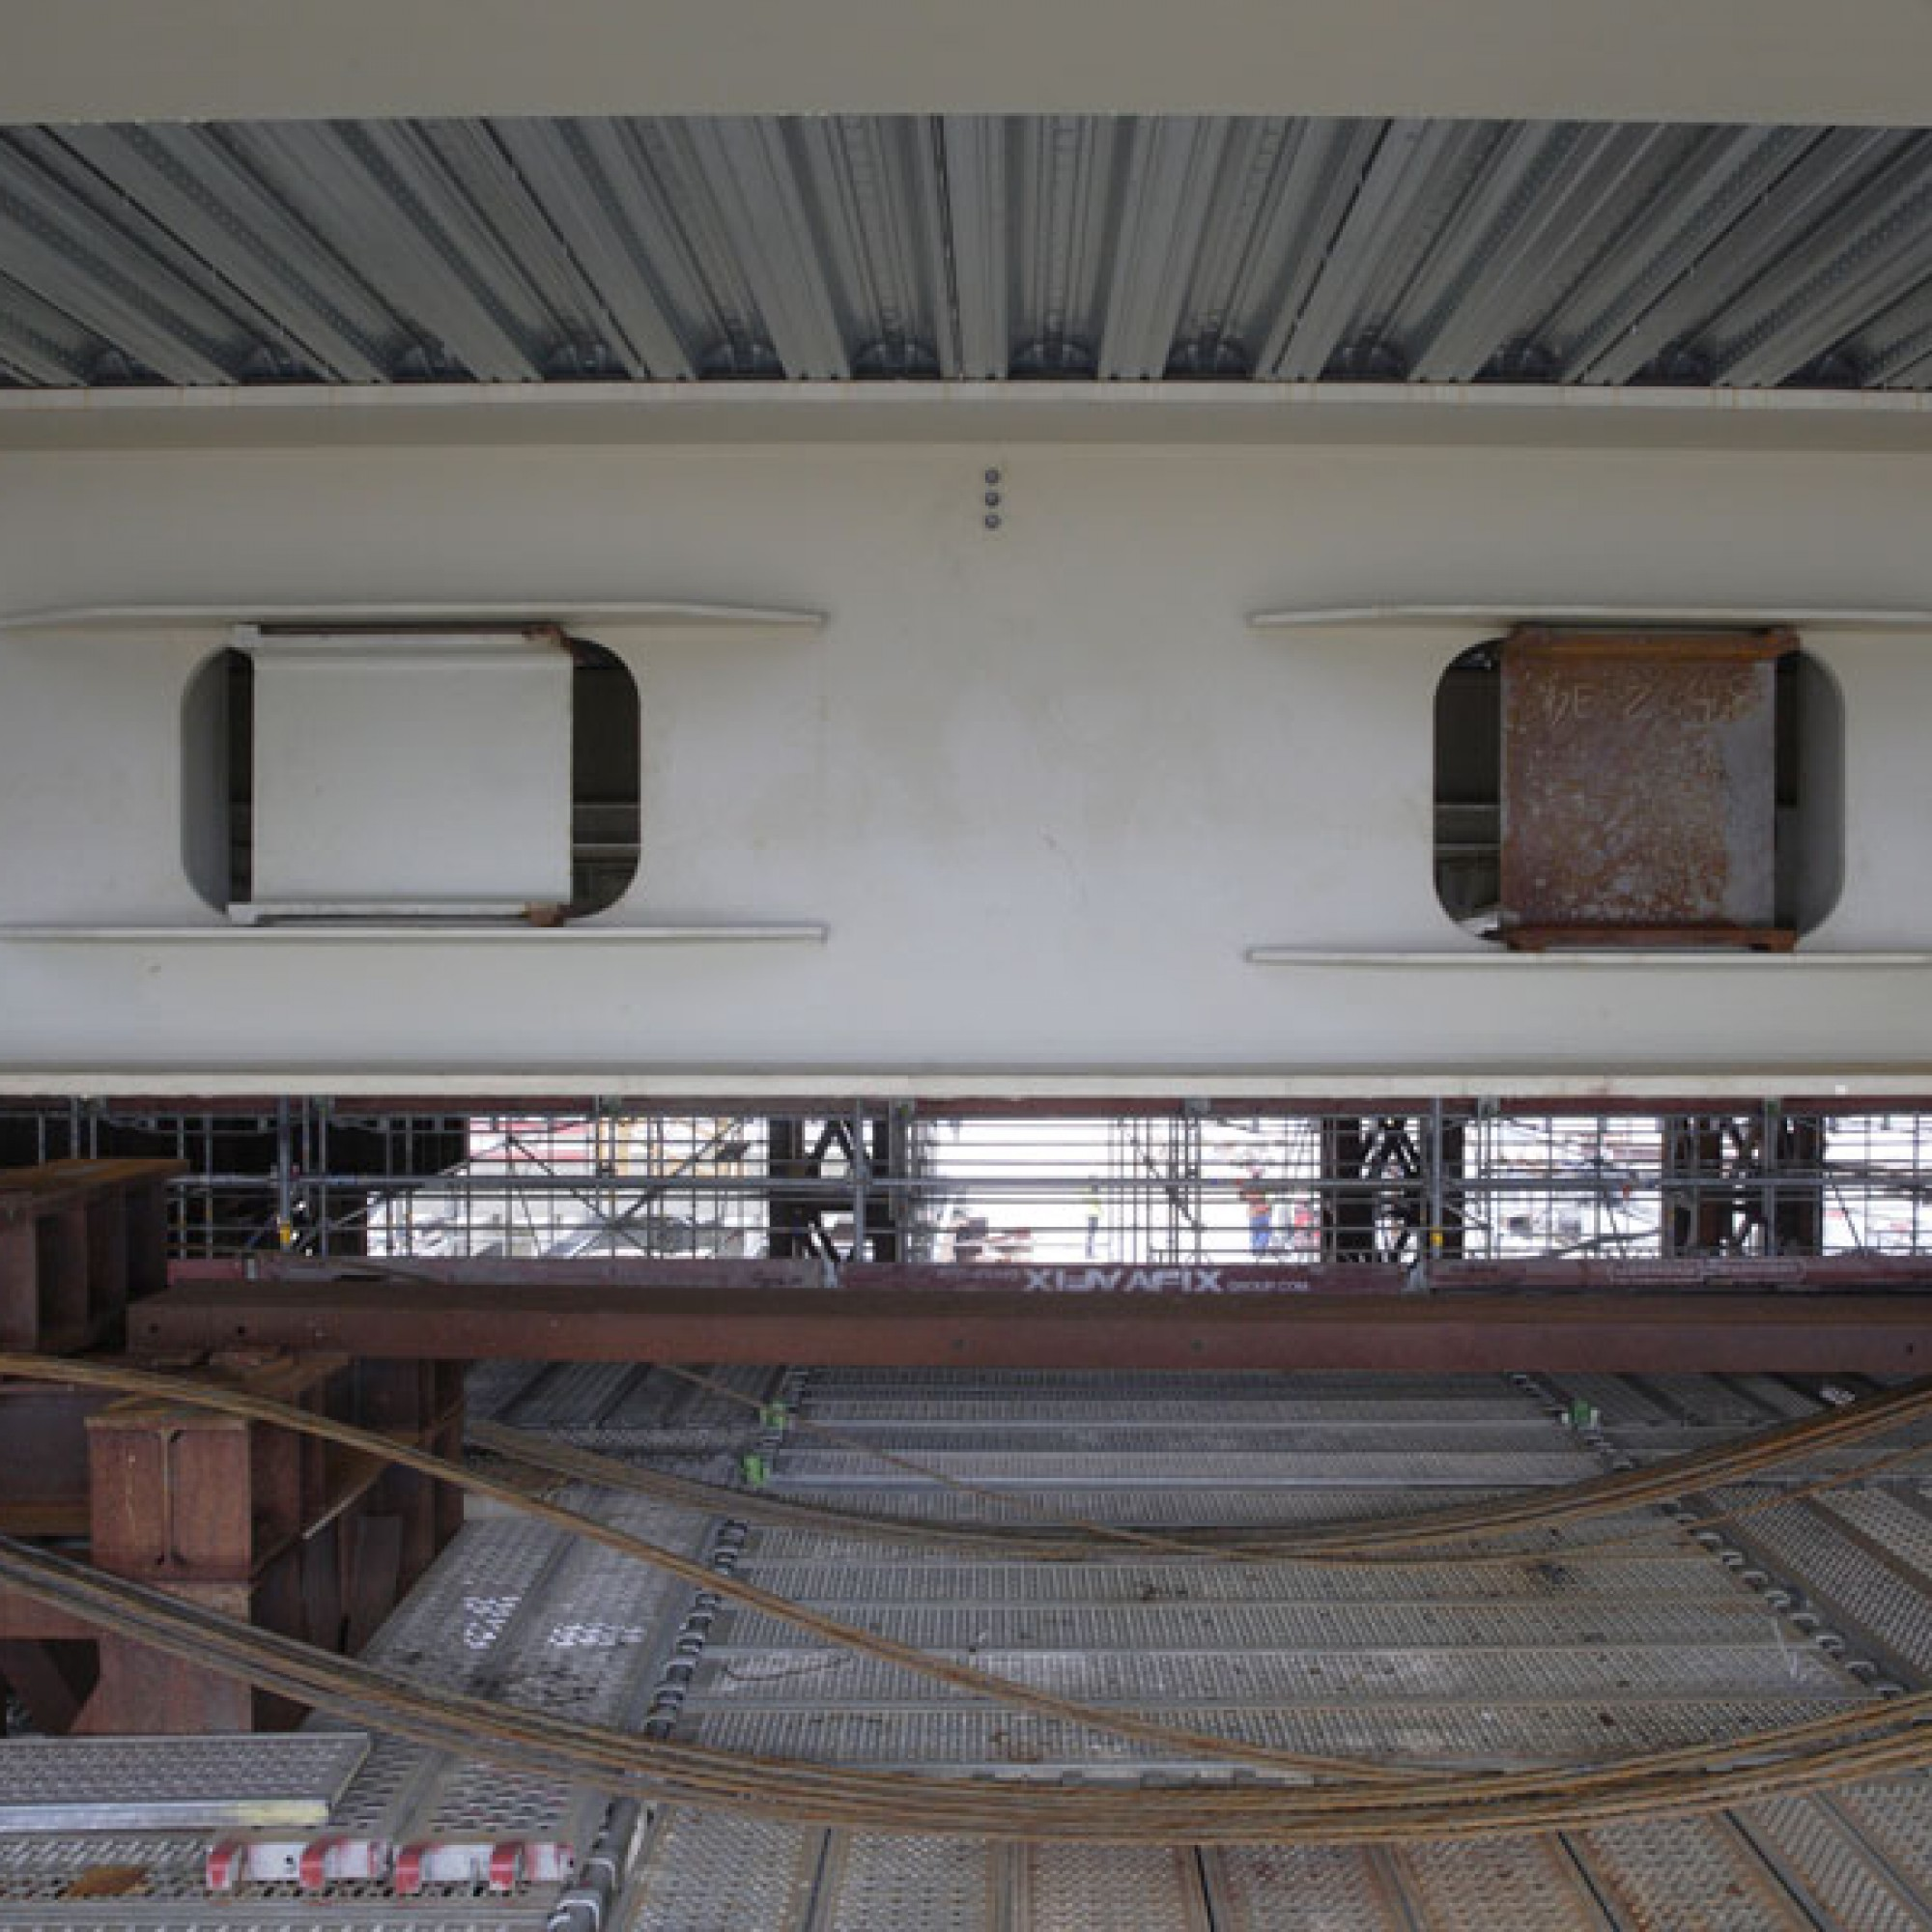 Weil während des Schubvorgangs enorme Querkräfte wirken, mussten Aussparungen in den Profilen temporär geschlossen beziehungsweise ausgesteift werden.